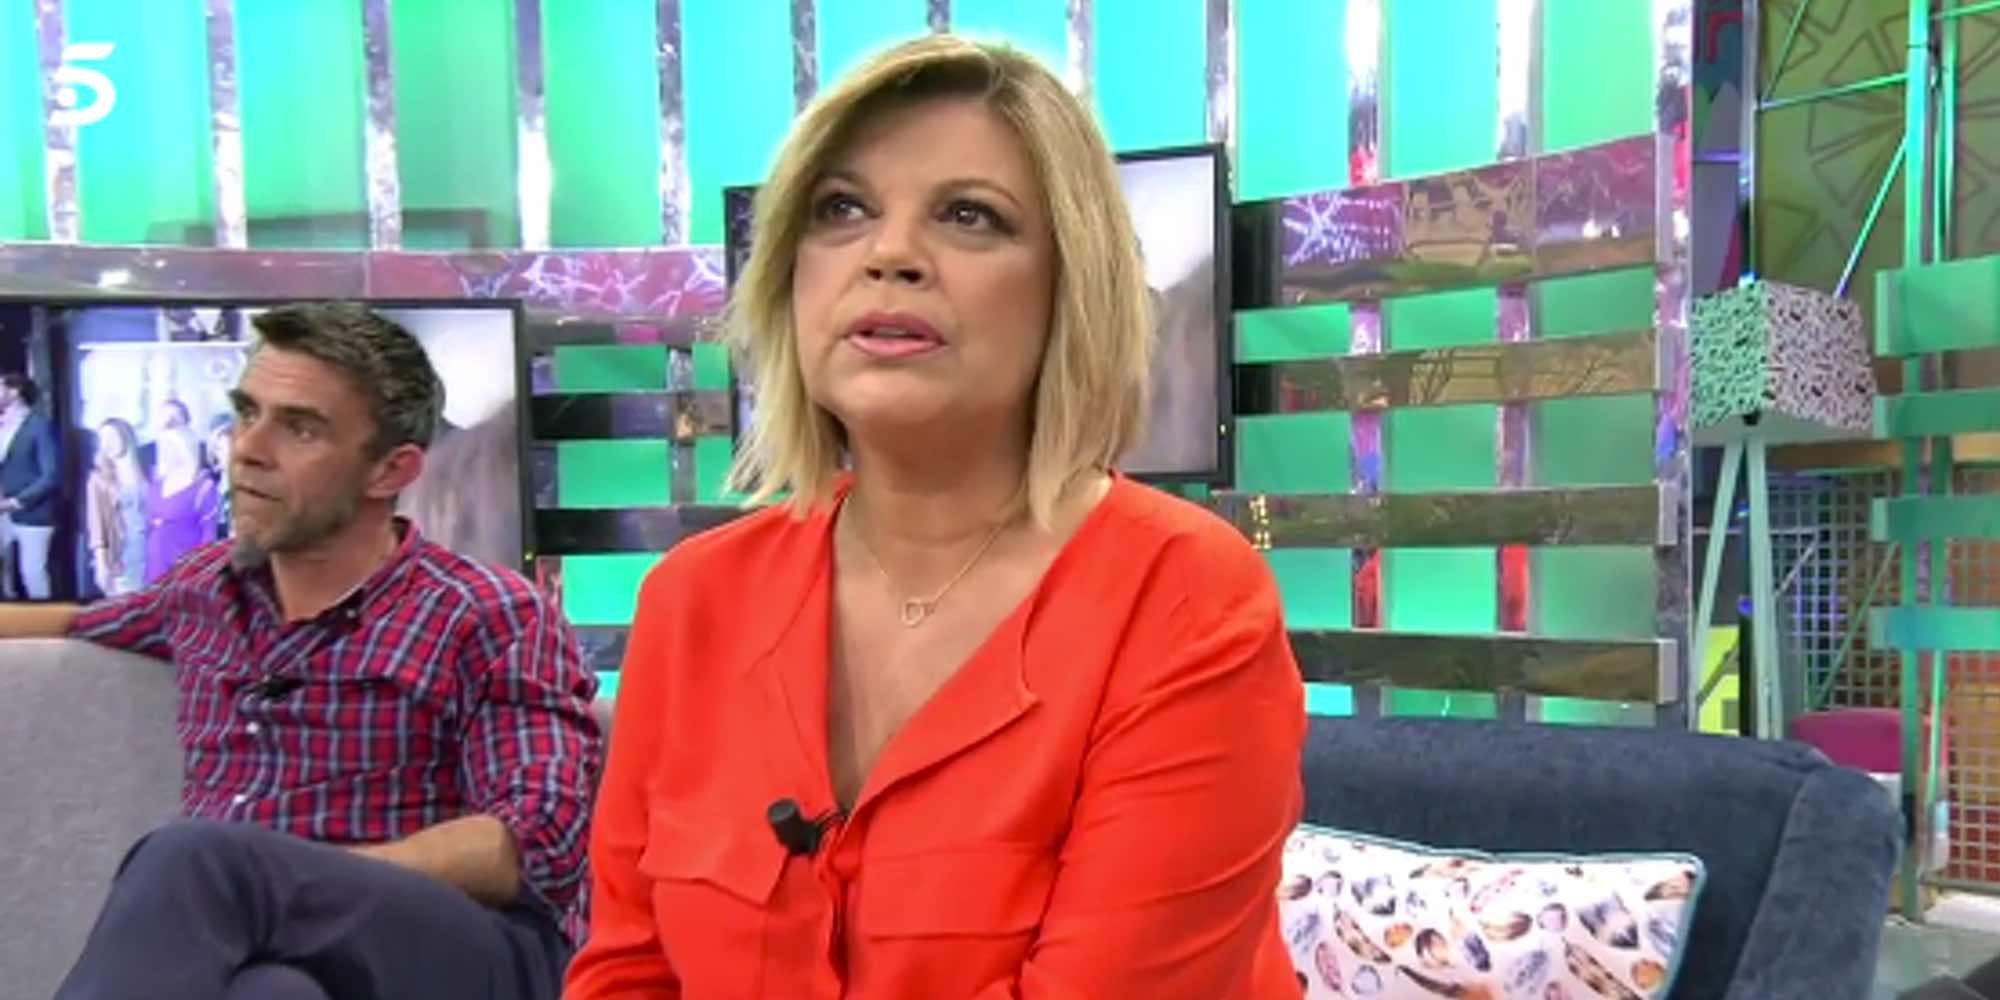 Terelu Campos abandona el plató de 'Sálvame' entre lágrimas tras estallar Mila Ximénez contra ella